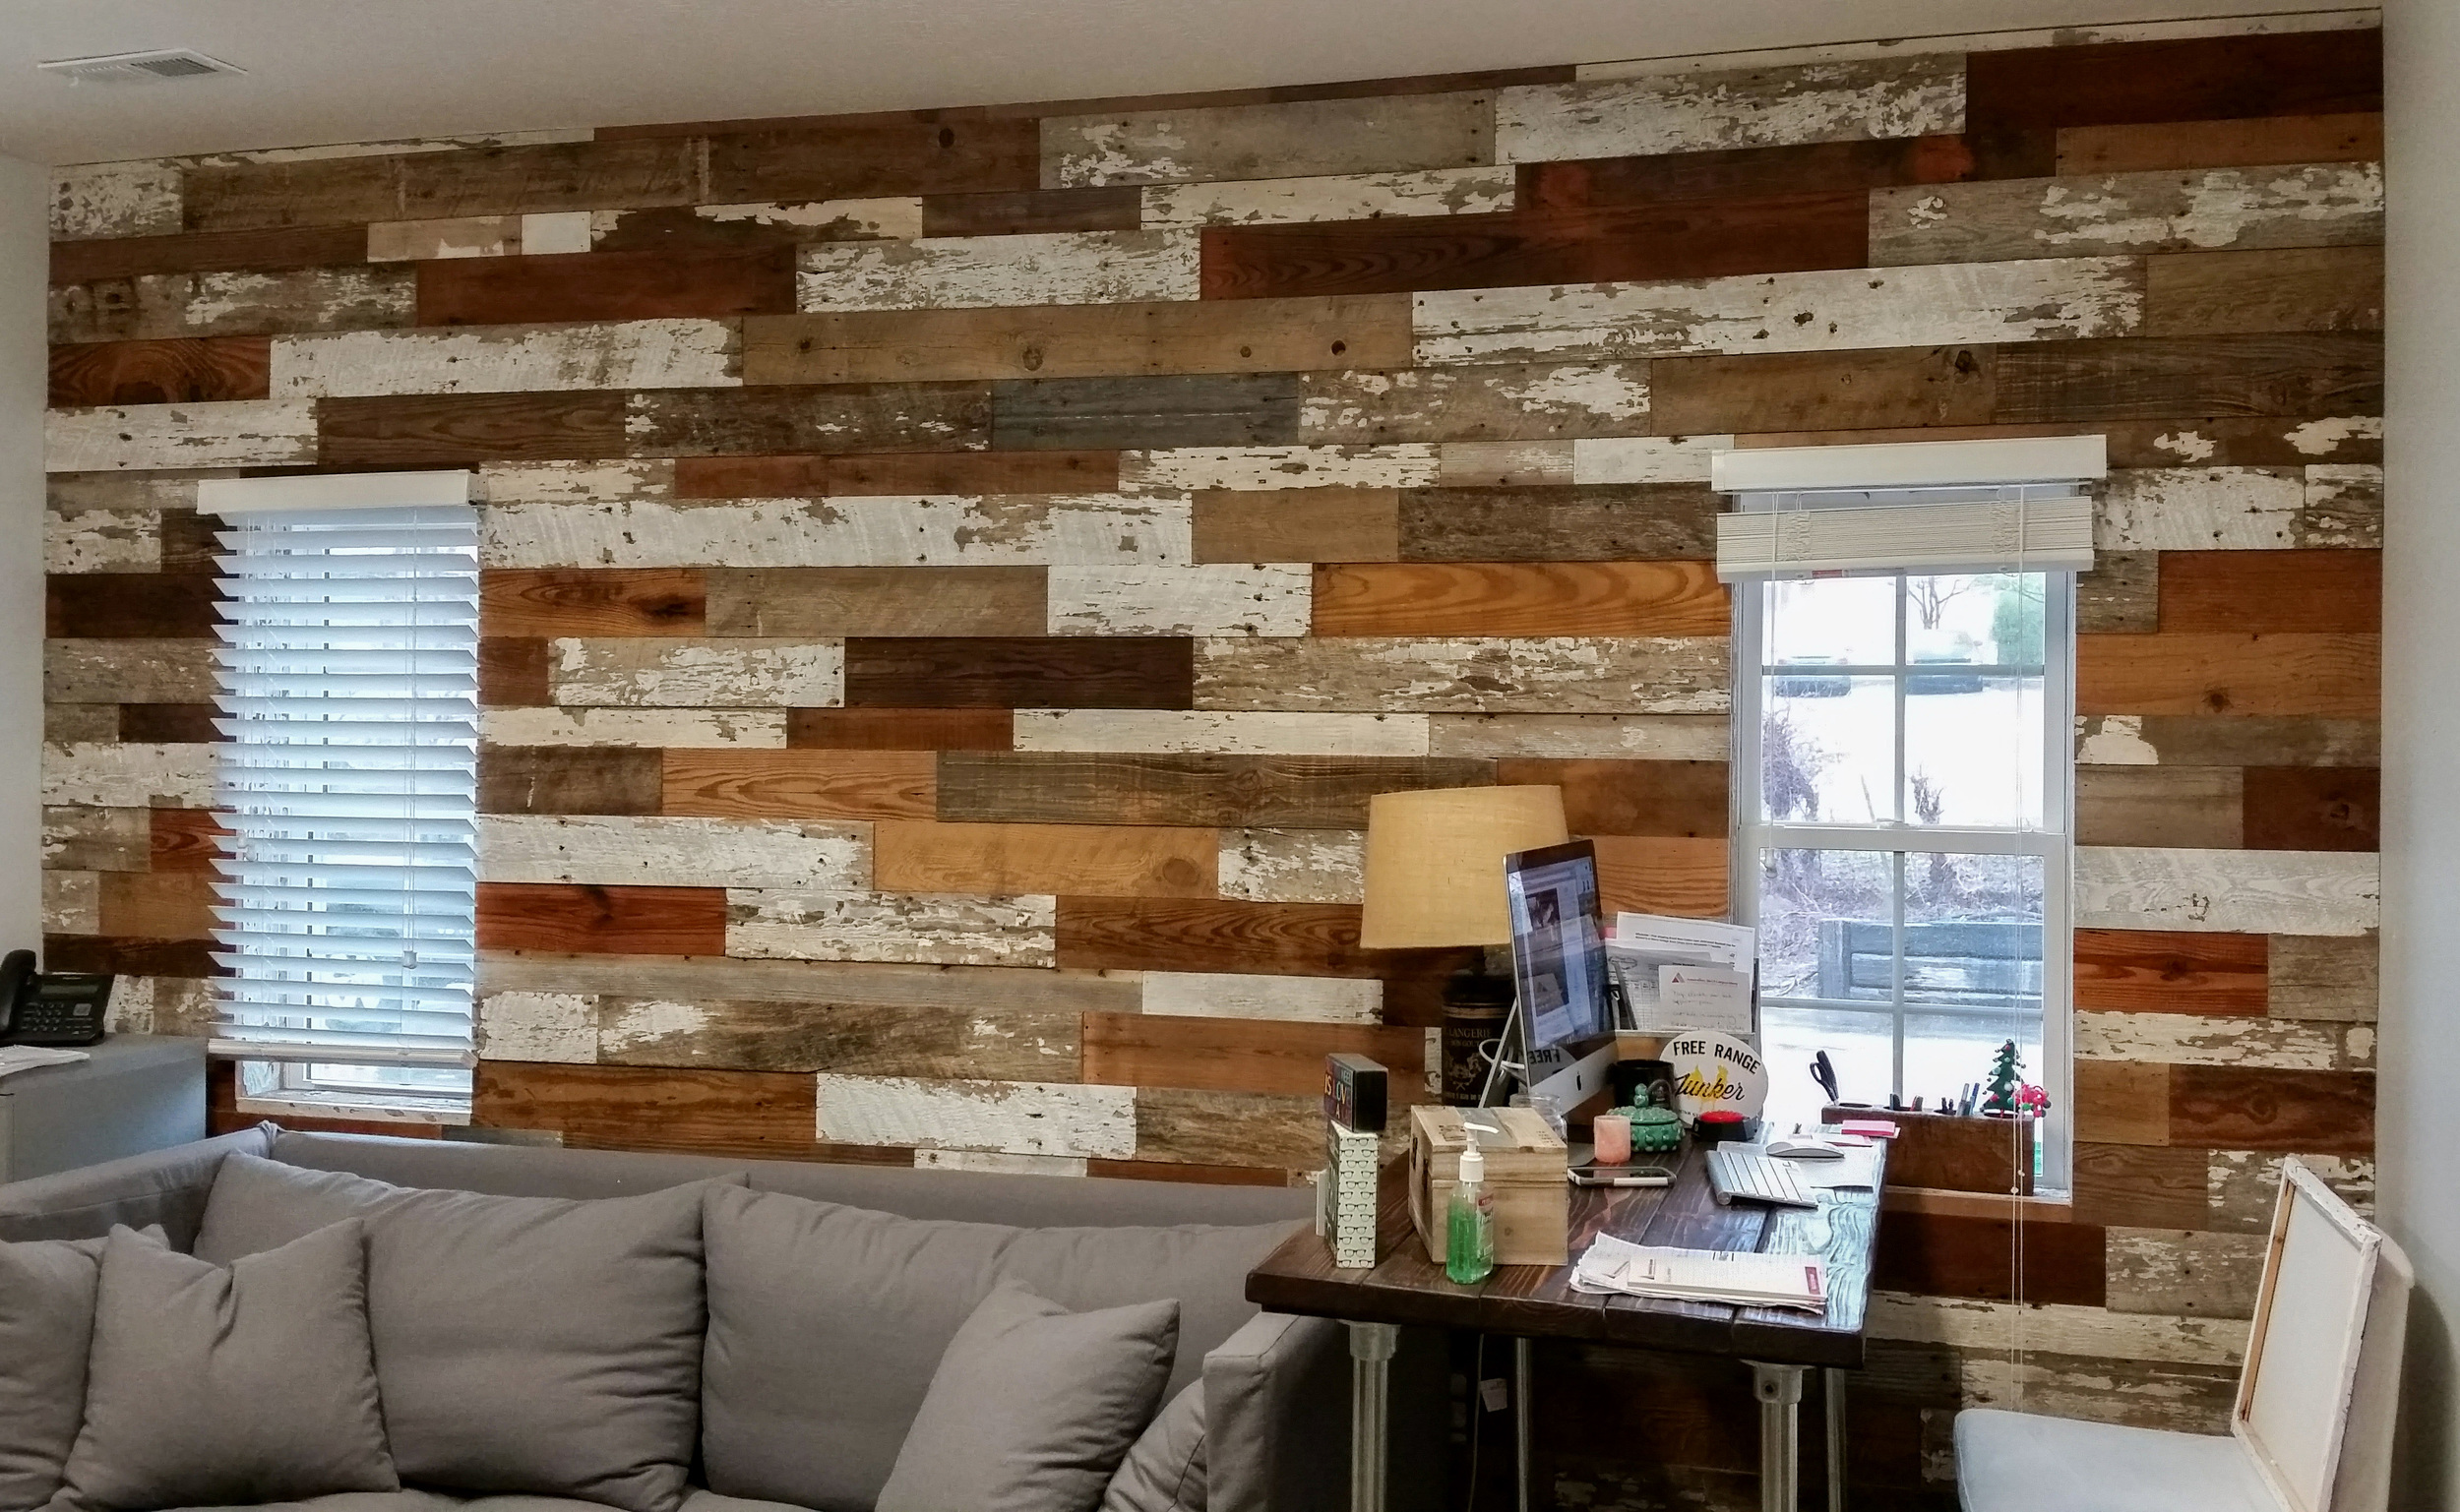 ludlow barnwood_accent wall 1.jpg